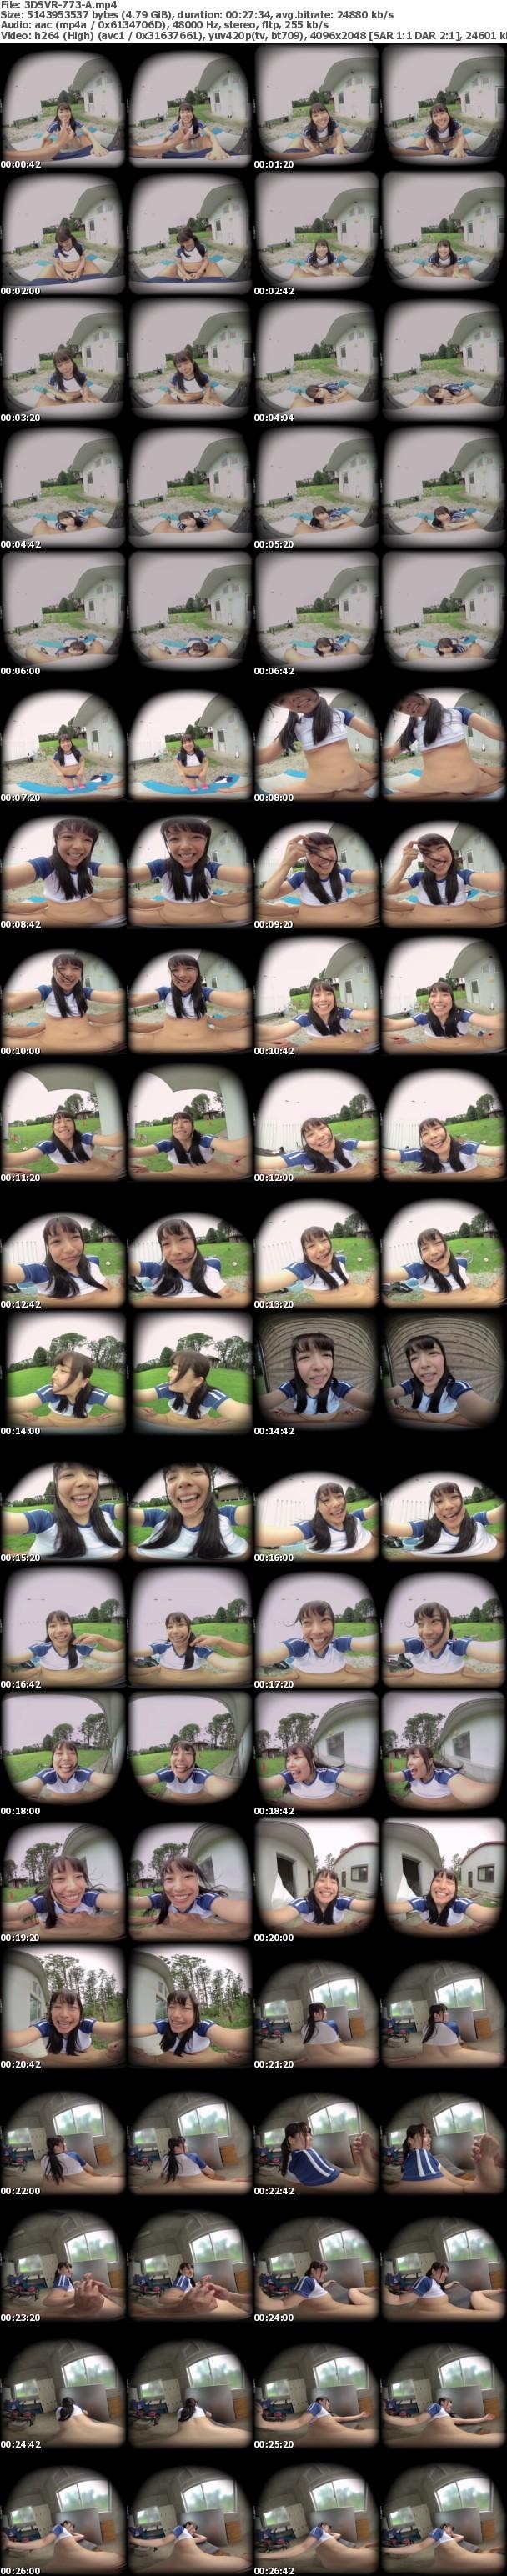 (VR) 3DSVR-773 【新視点移動VRカメラ採用】だいしゅきホールドVR 『センパ~イ抱っこして♪』後輩J○が先輩の僕にくっついて離れない!挿れっぱなし超リアル駅弁・座位・カニバサミアングルを完全密着体感!! 宮沢ちはる